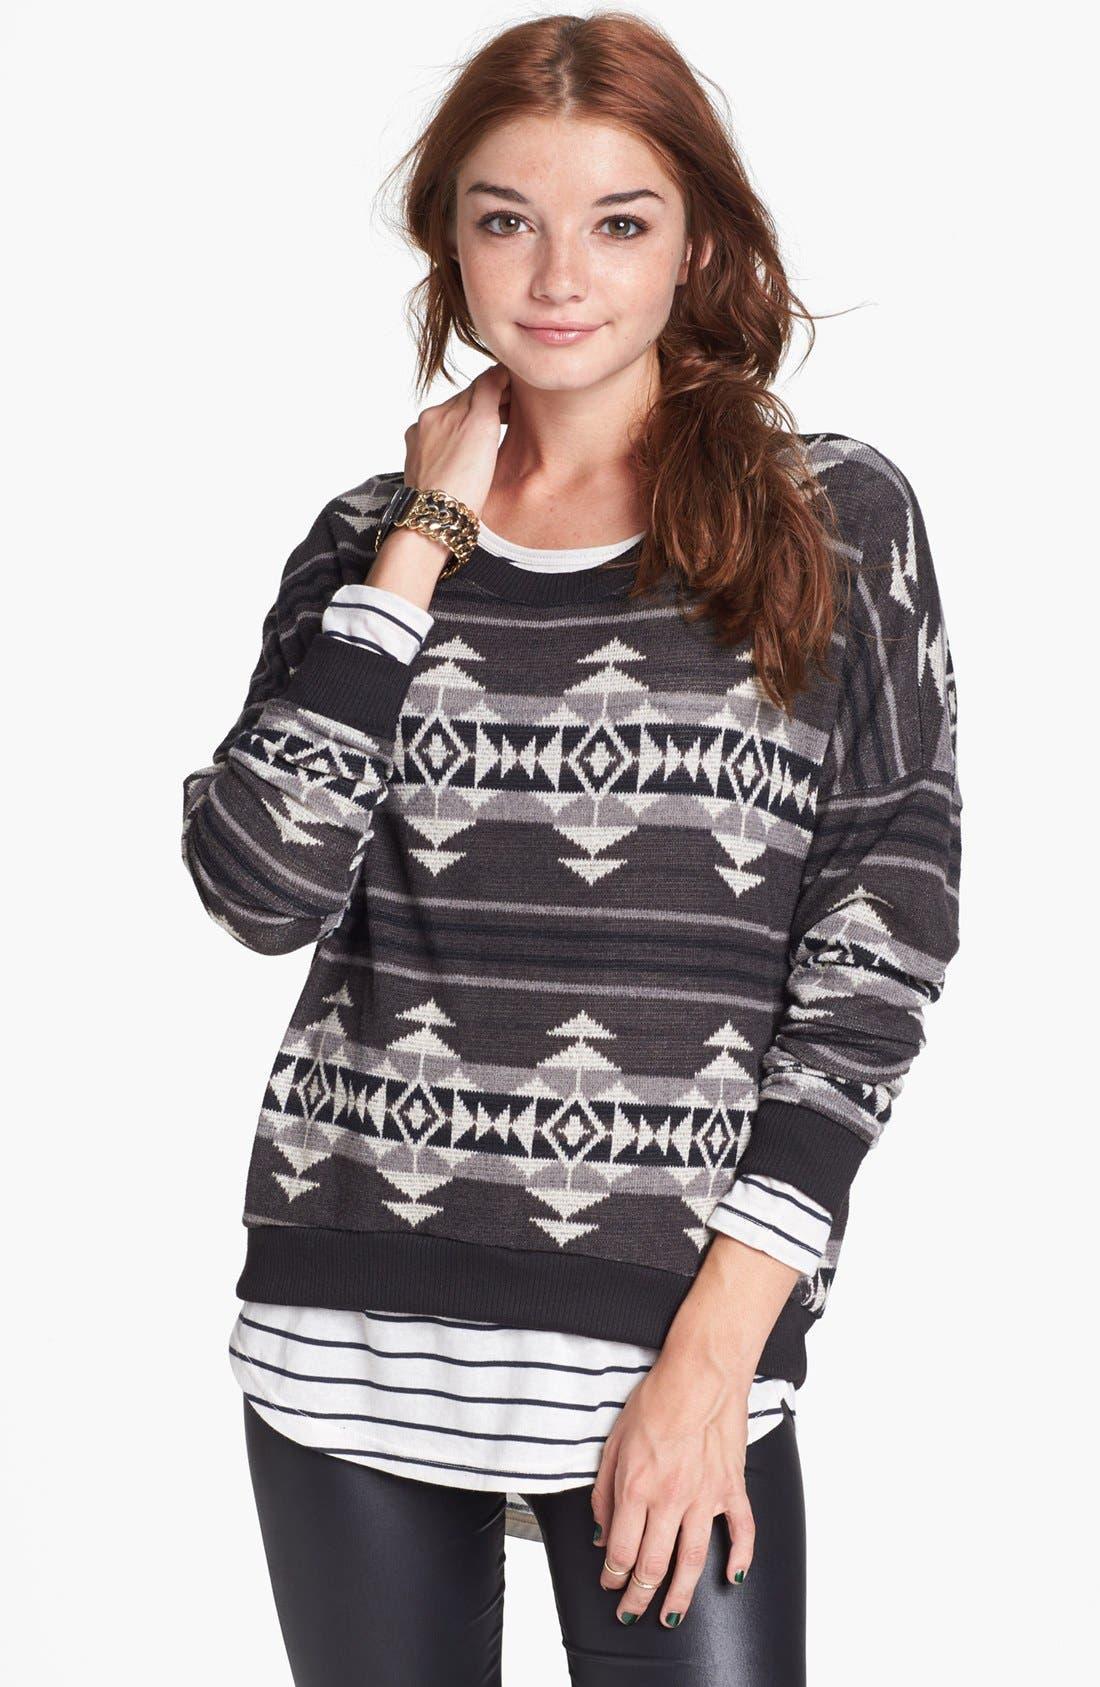 Alternate Image 1 Selected - Painted Threads Geometric Pattern Sweatshirt (Juniors)